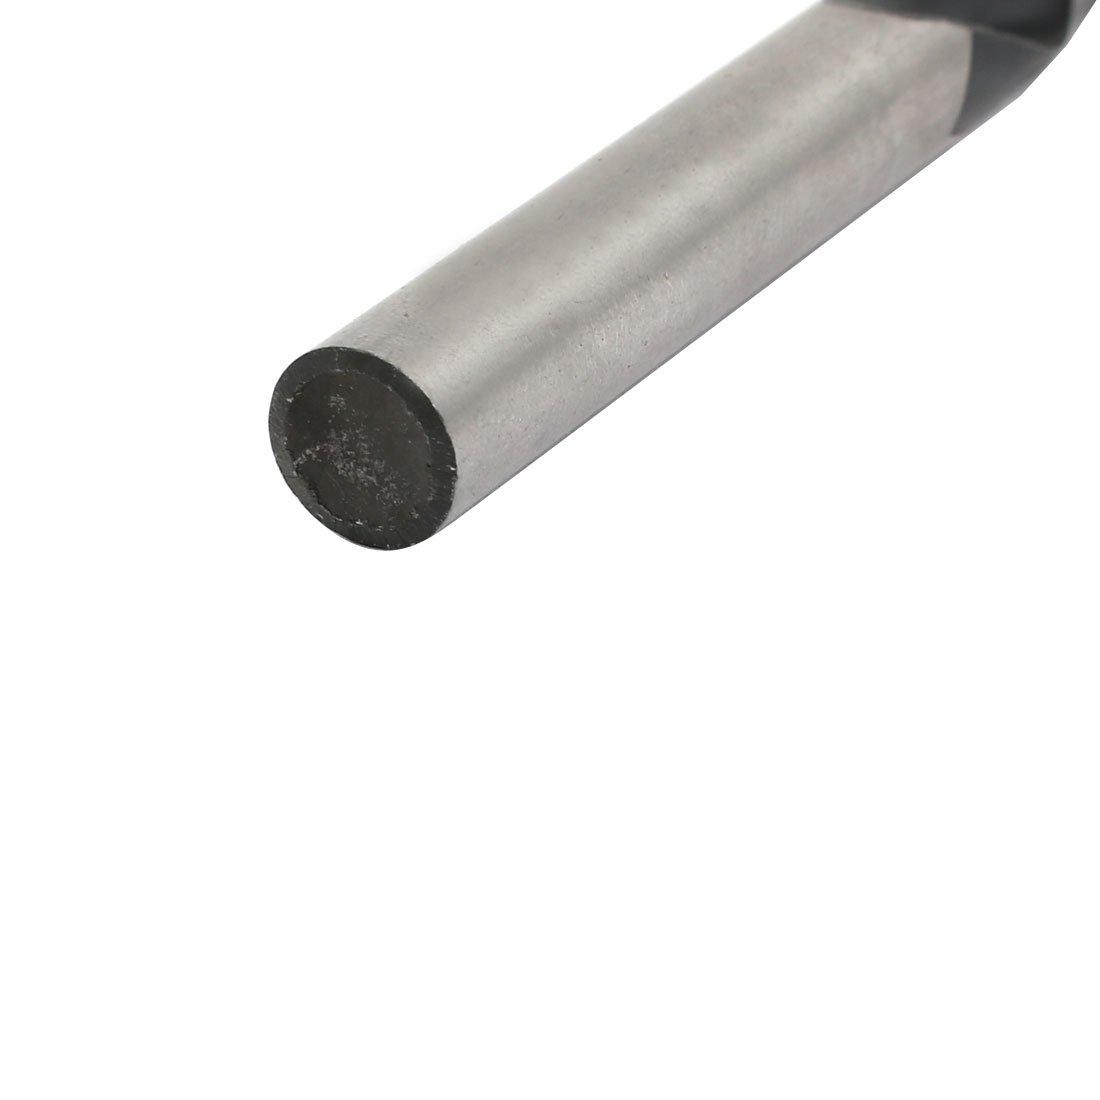 uxcell 9mm Dia 120mm Length HSS Round Shank Twist Drill Bit Drilling Tool